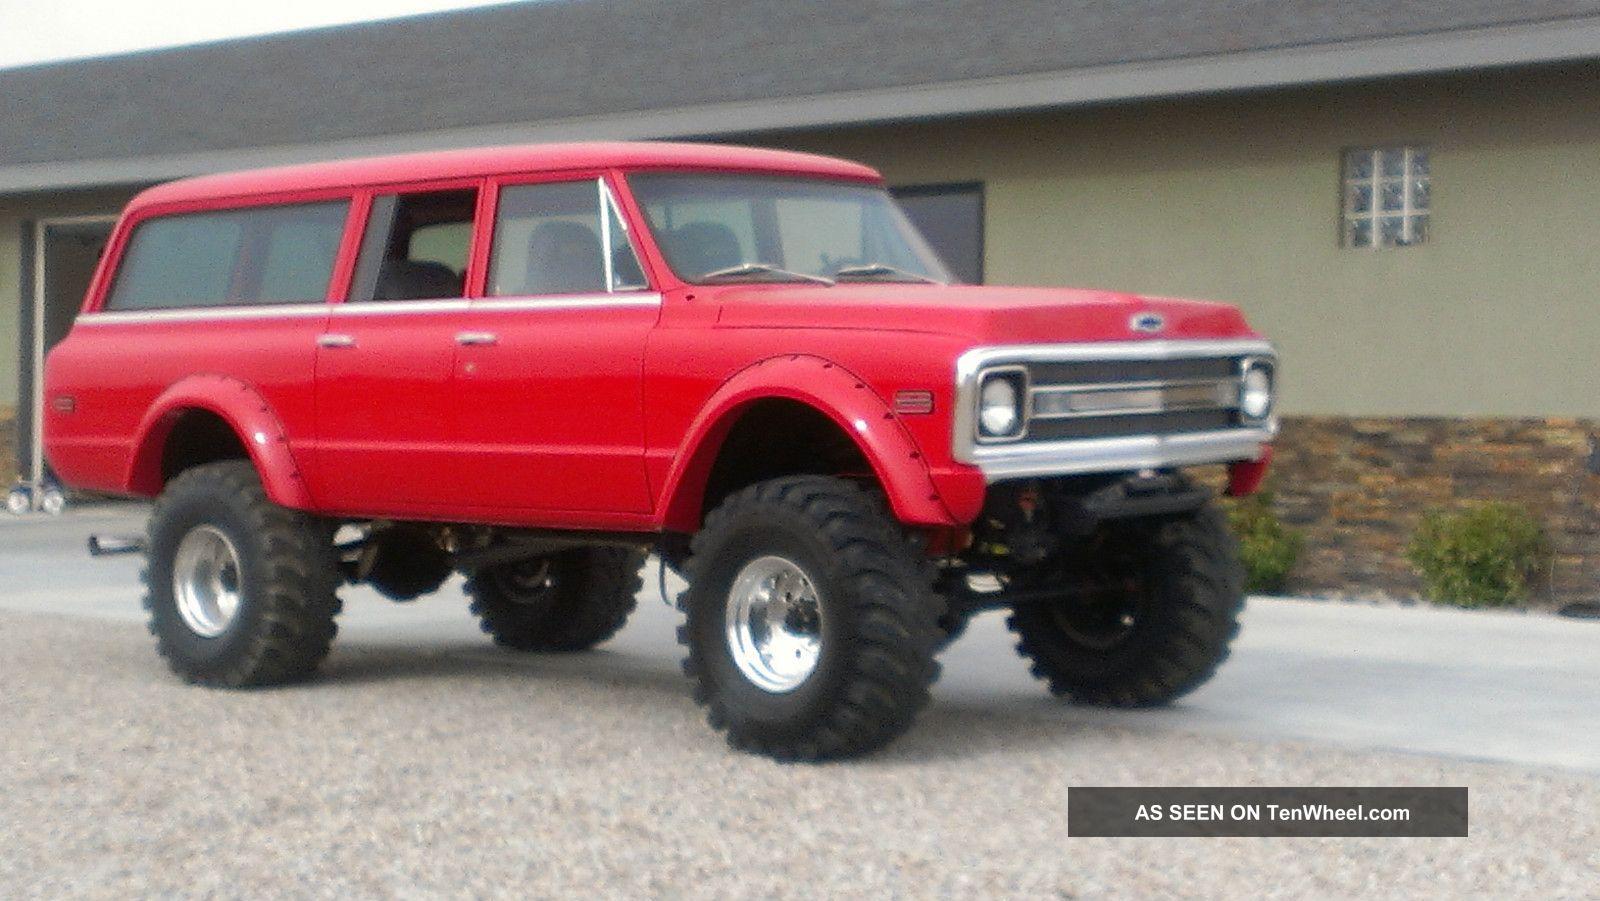 radical custom 1970 3 door chevy suburban 4x41970 Chevy Suburban 4x4 #4